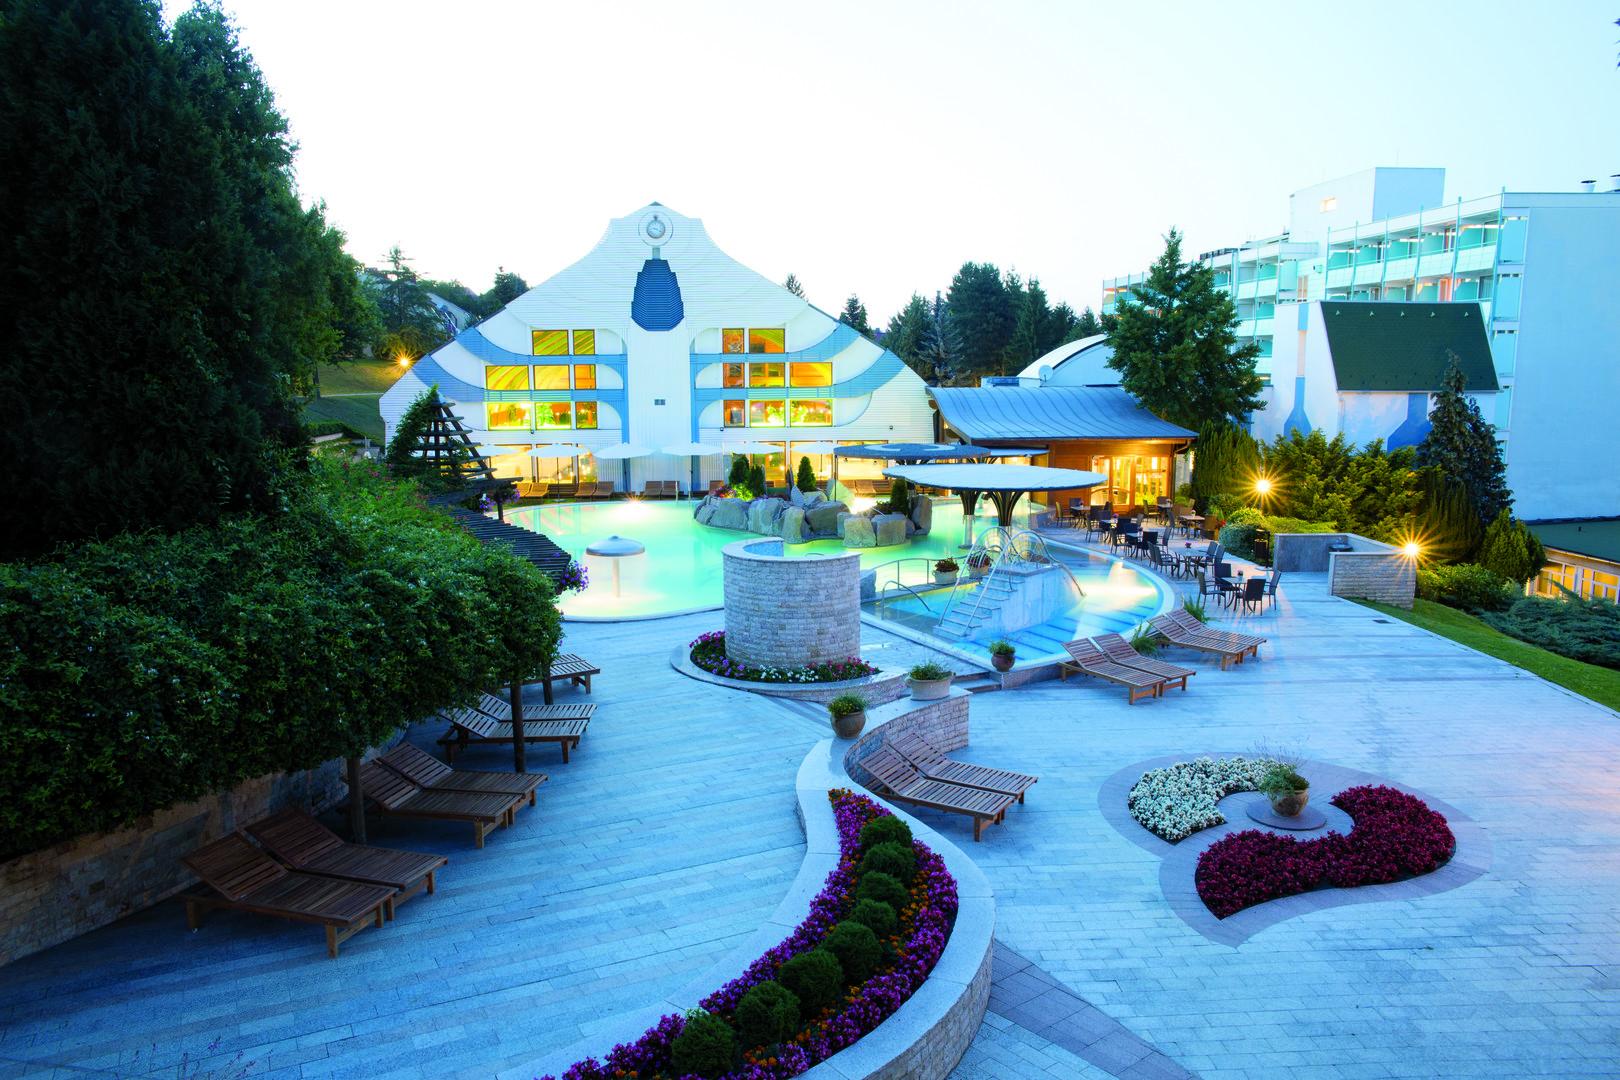 NaturMed Hotel Carbona #6